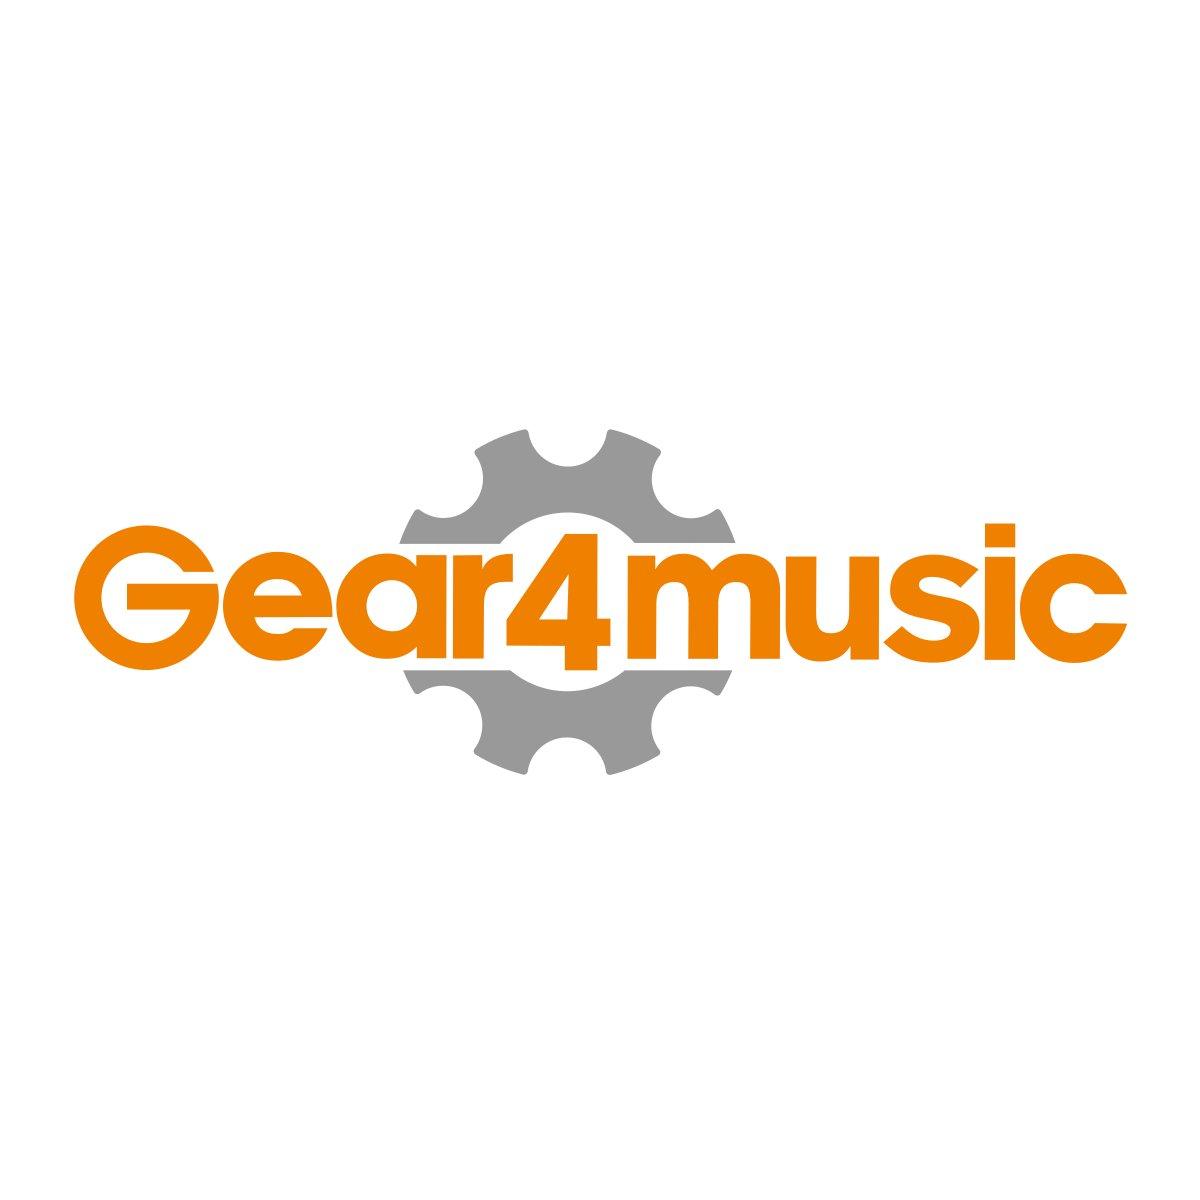 LA II sähkökitara SSS Gear4music, musta